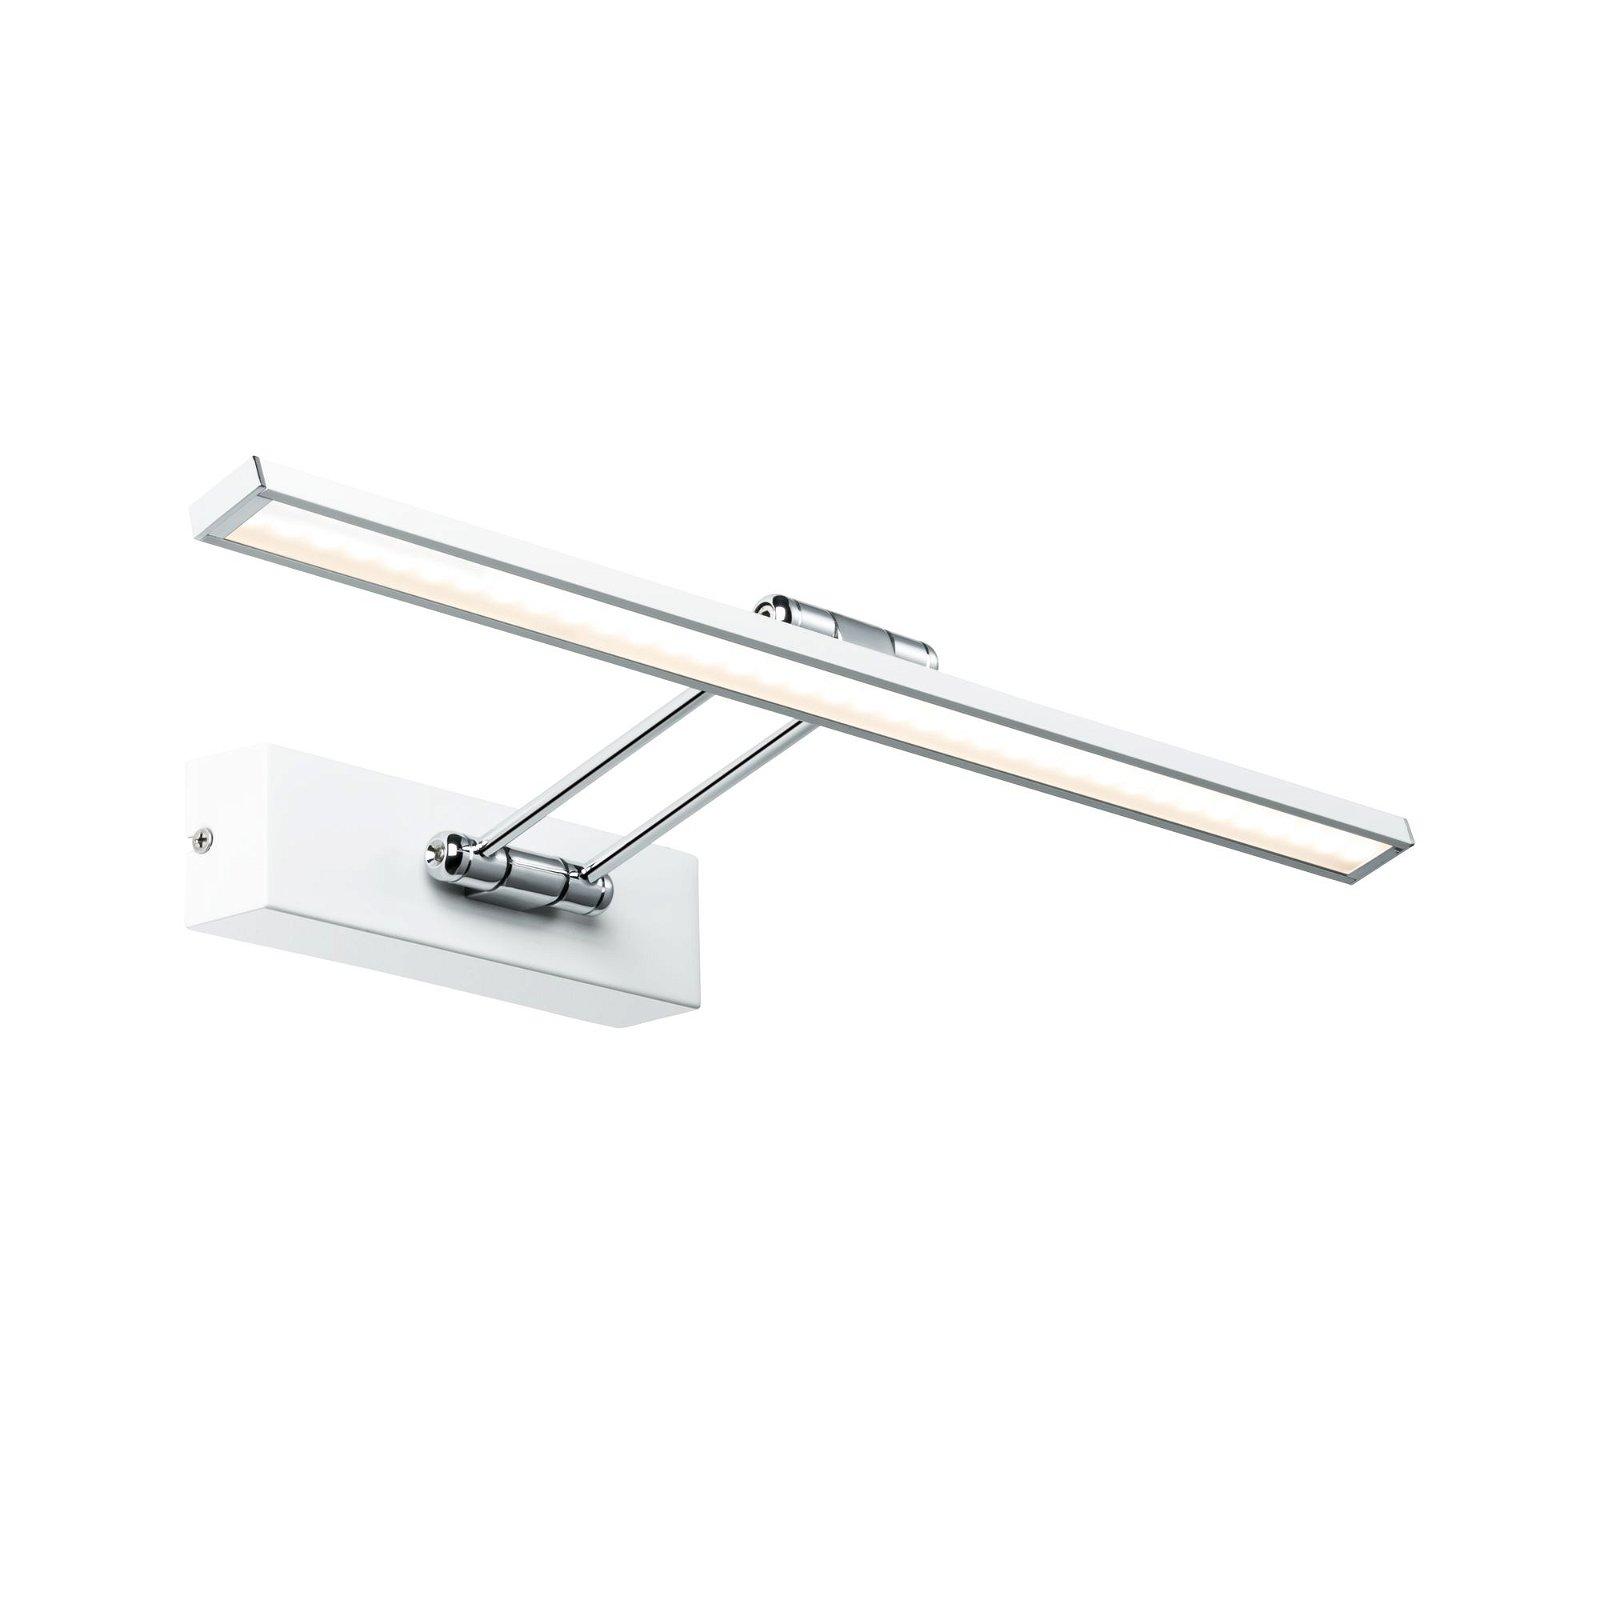 Galeria LED-schilderijlamp Beam 2700K 850lm 230V 7W Wit/Chroom